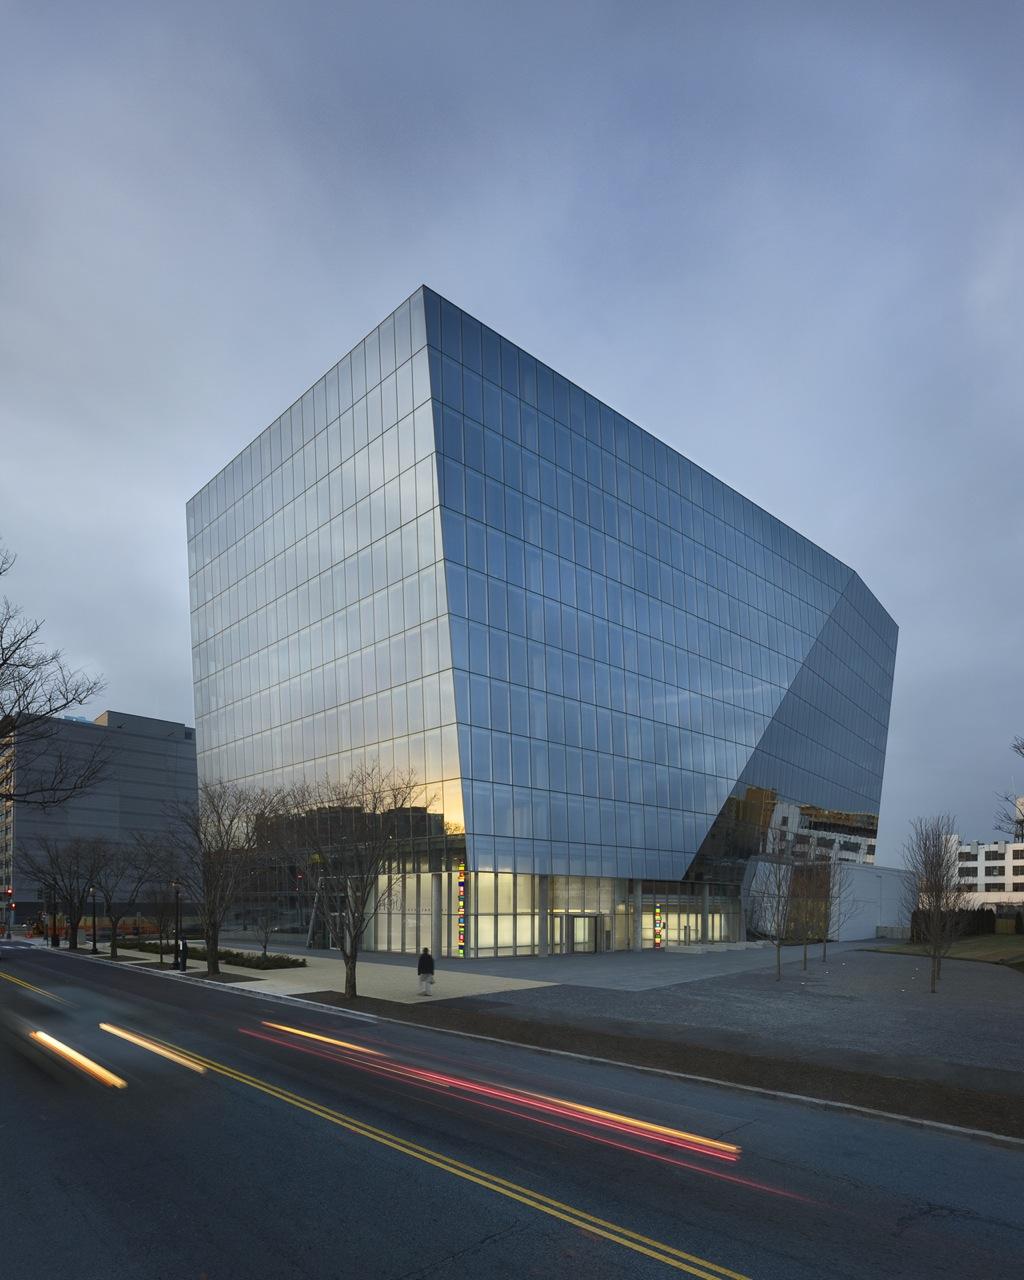 1100 First Street / Krueck & Sexton Architects, Courtesy of Prakash Patel